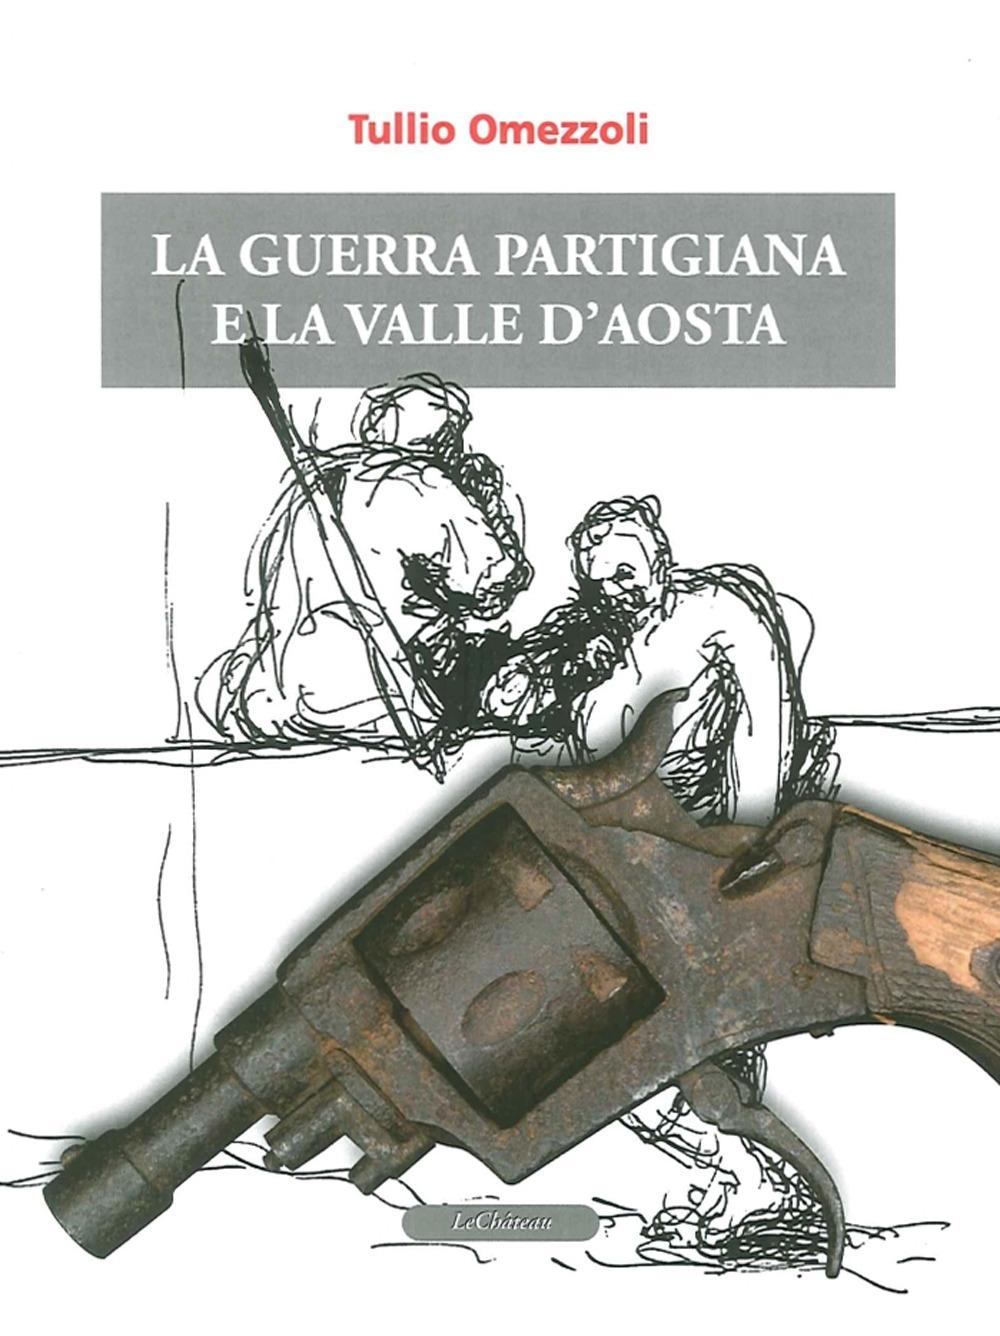 La Guerra Partigiana e la Valle d'Aosta.